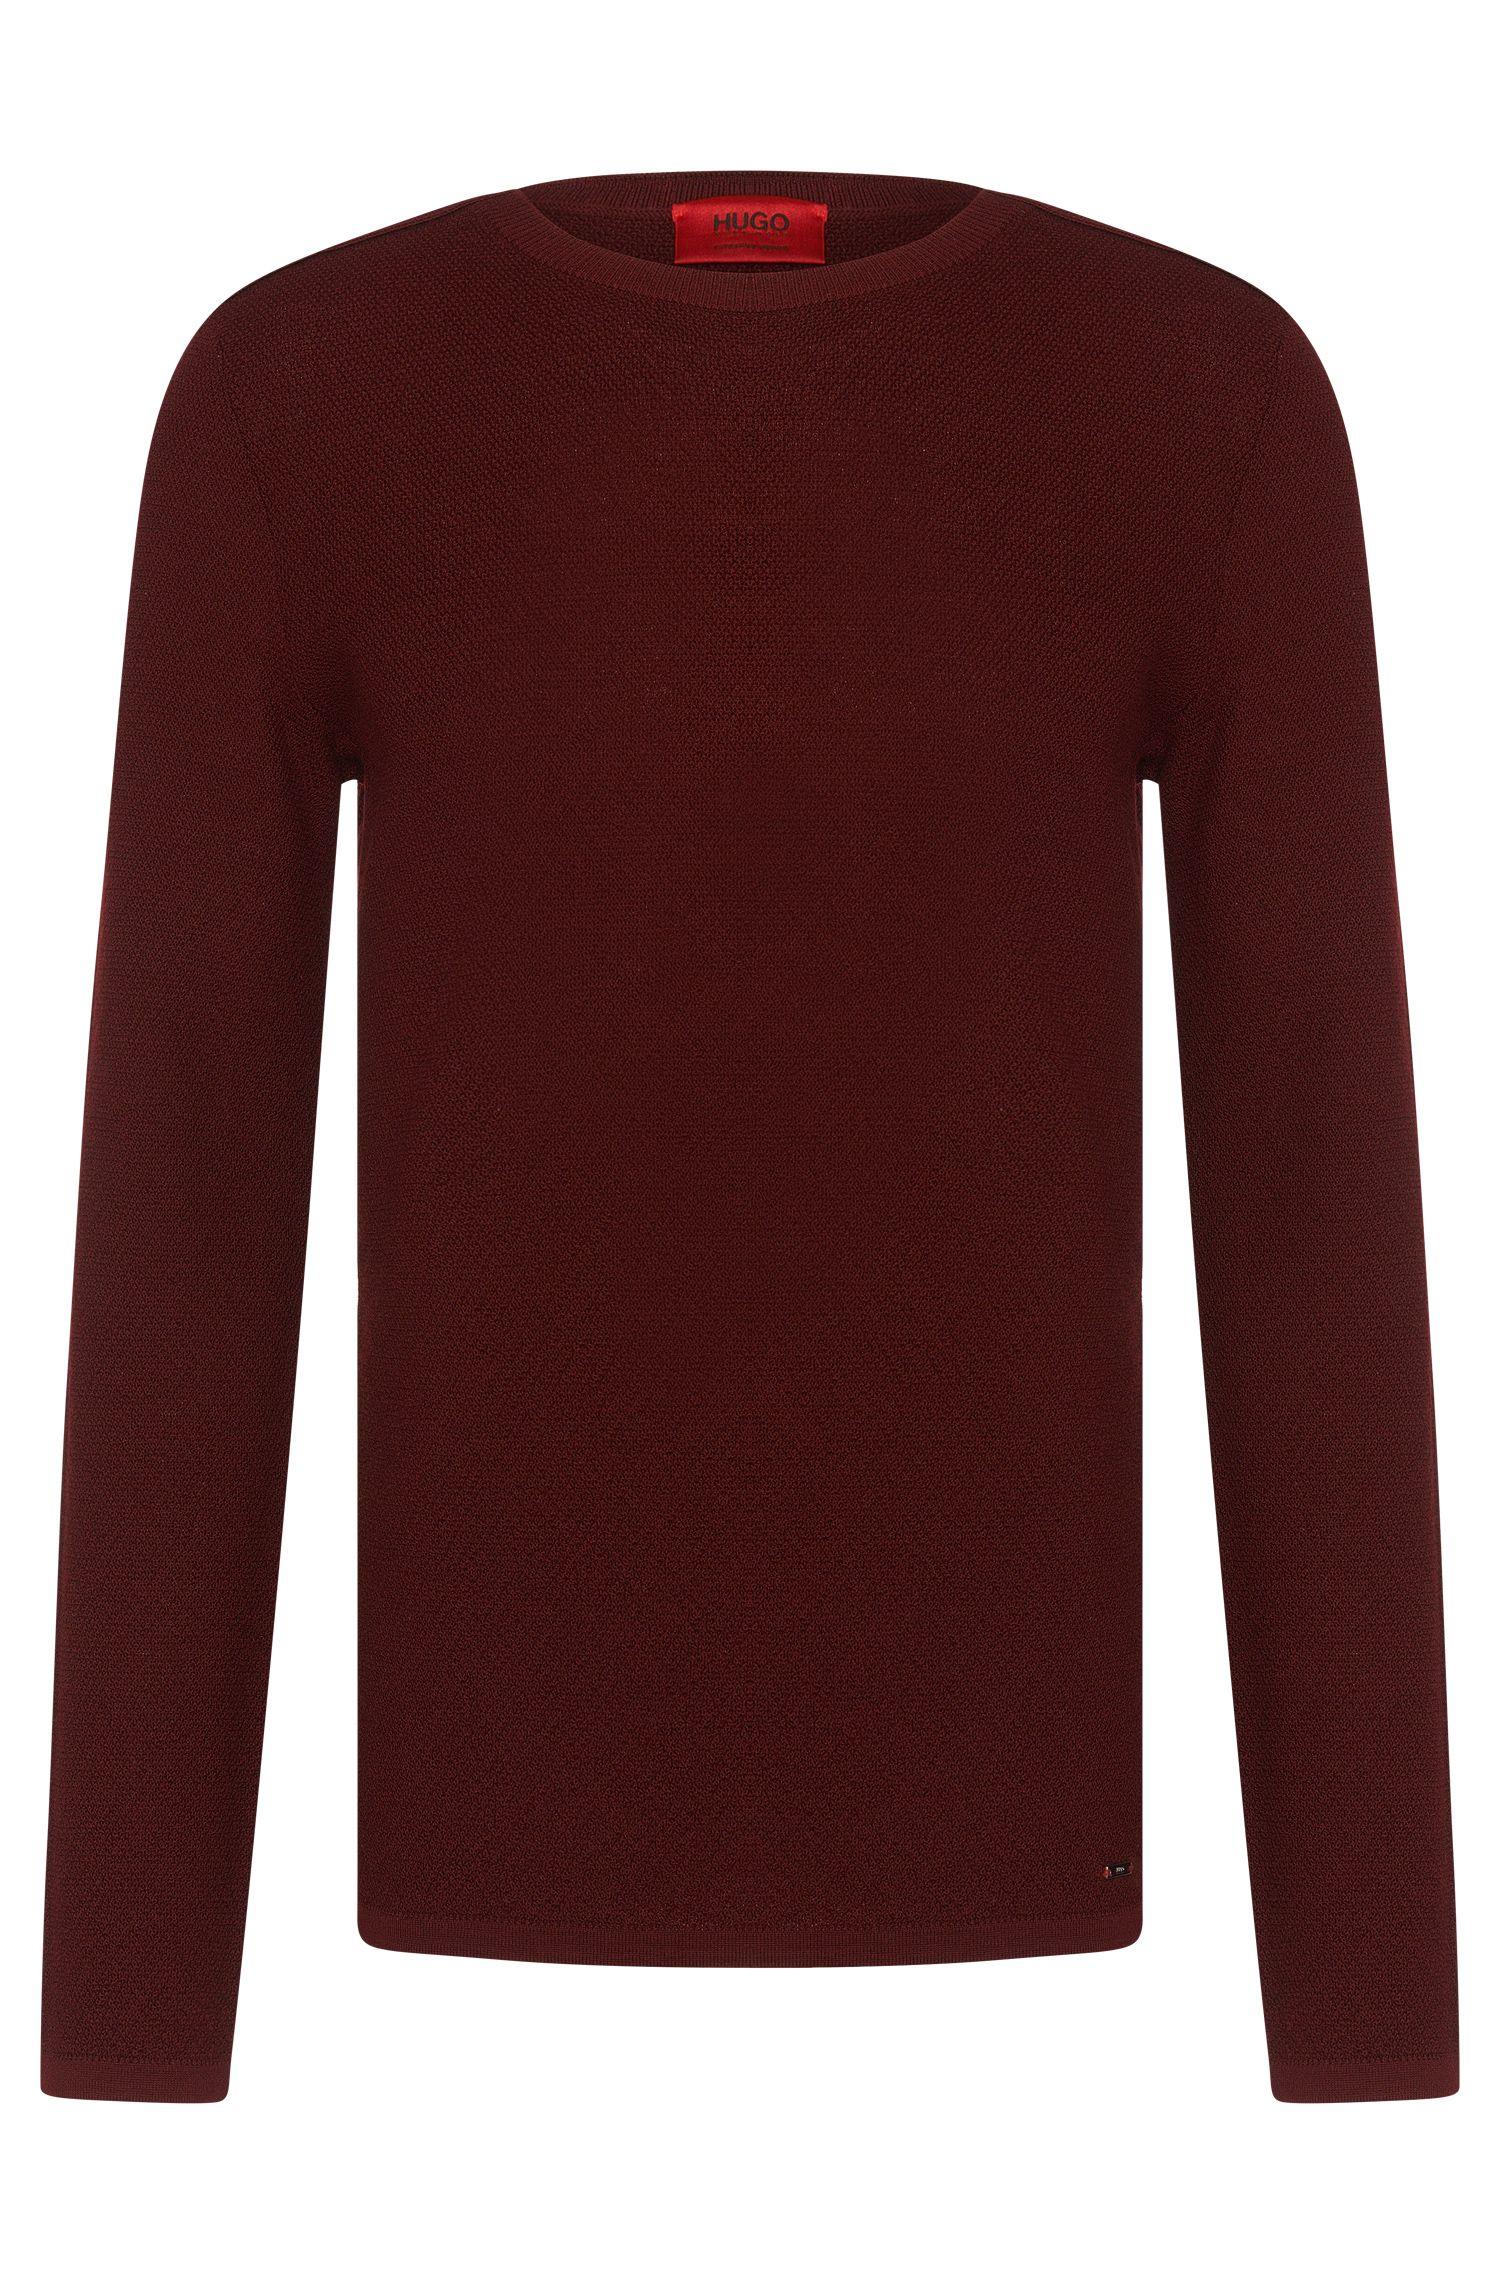 'Salexo' | Merino Virgin Wool Textured Sweater